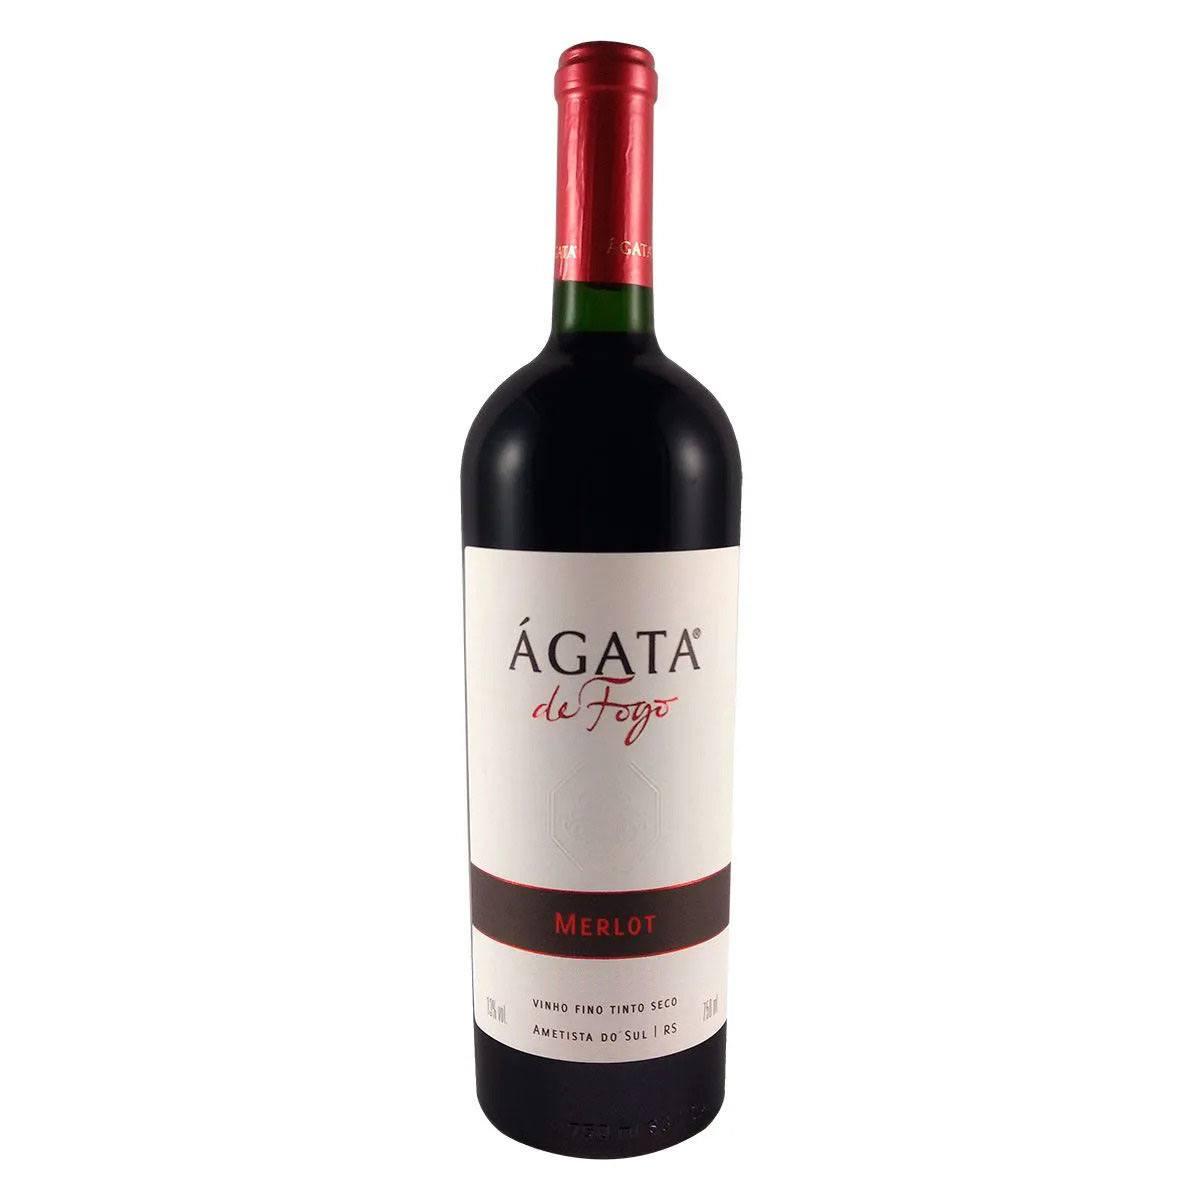 Vinho Fino Tinto Seco Ágata de Fogo Merlot 750ml